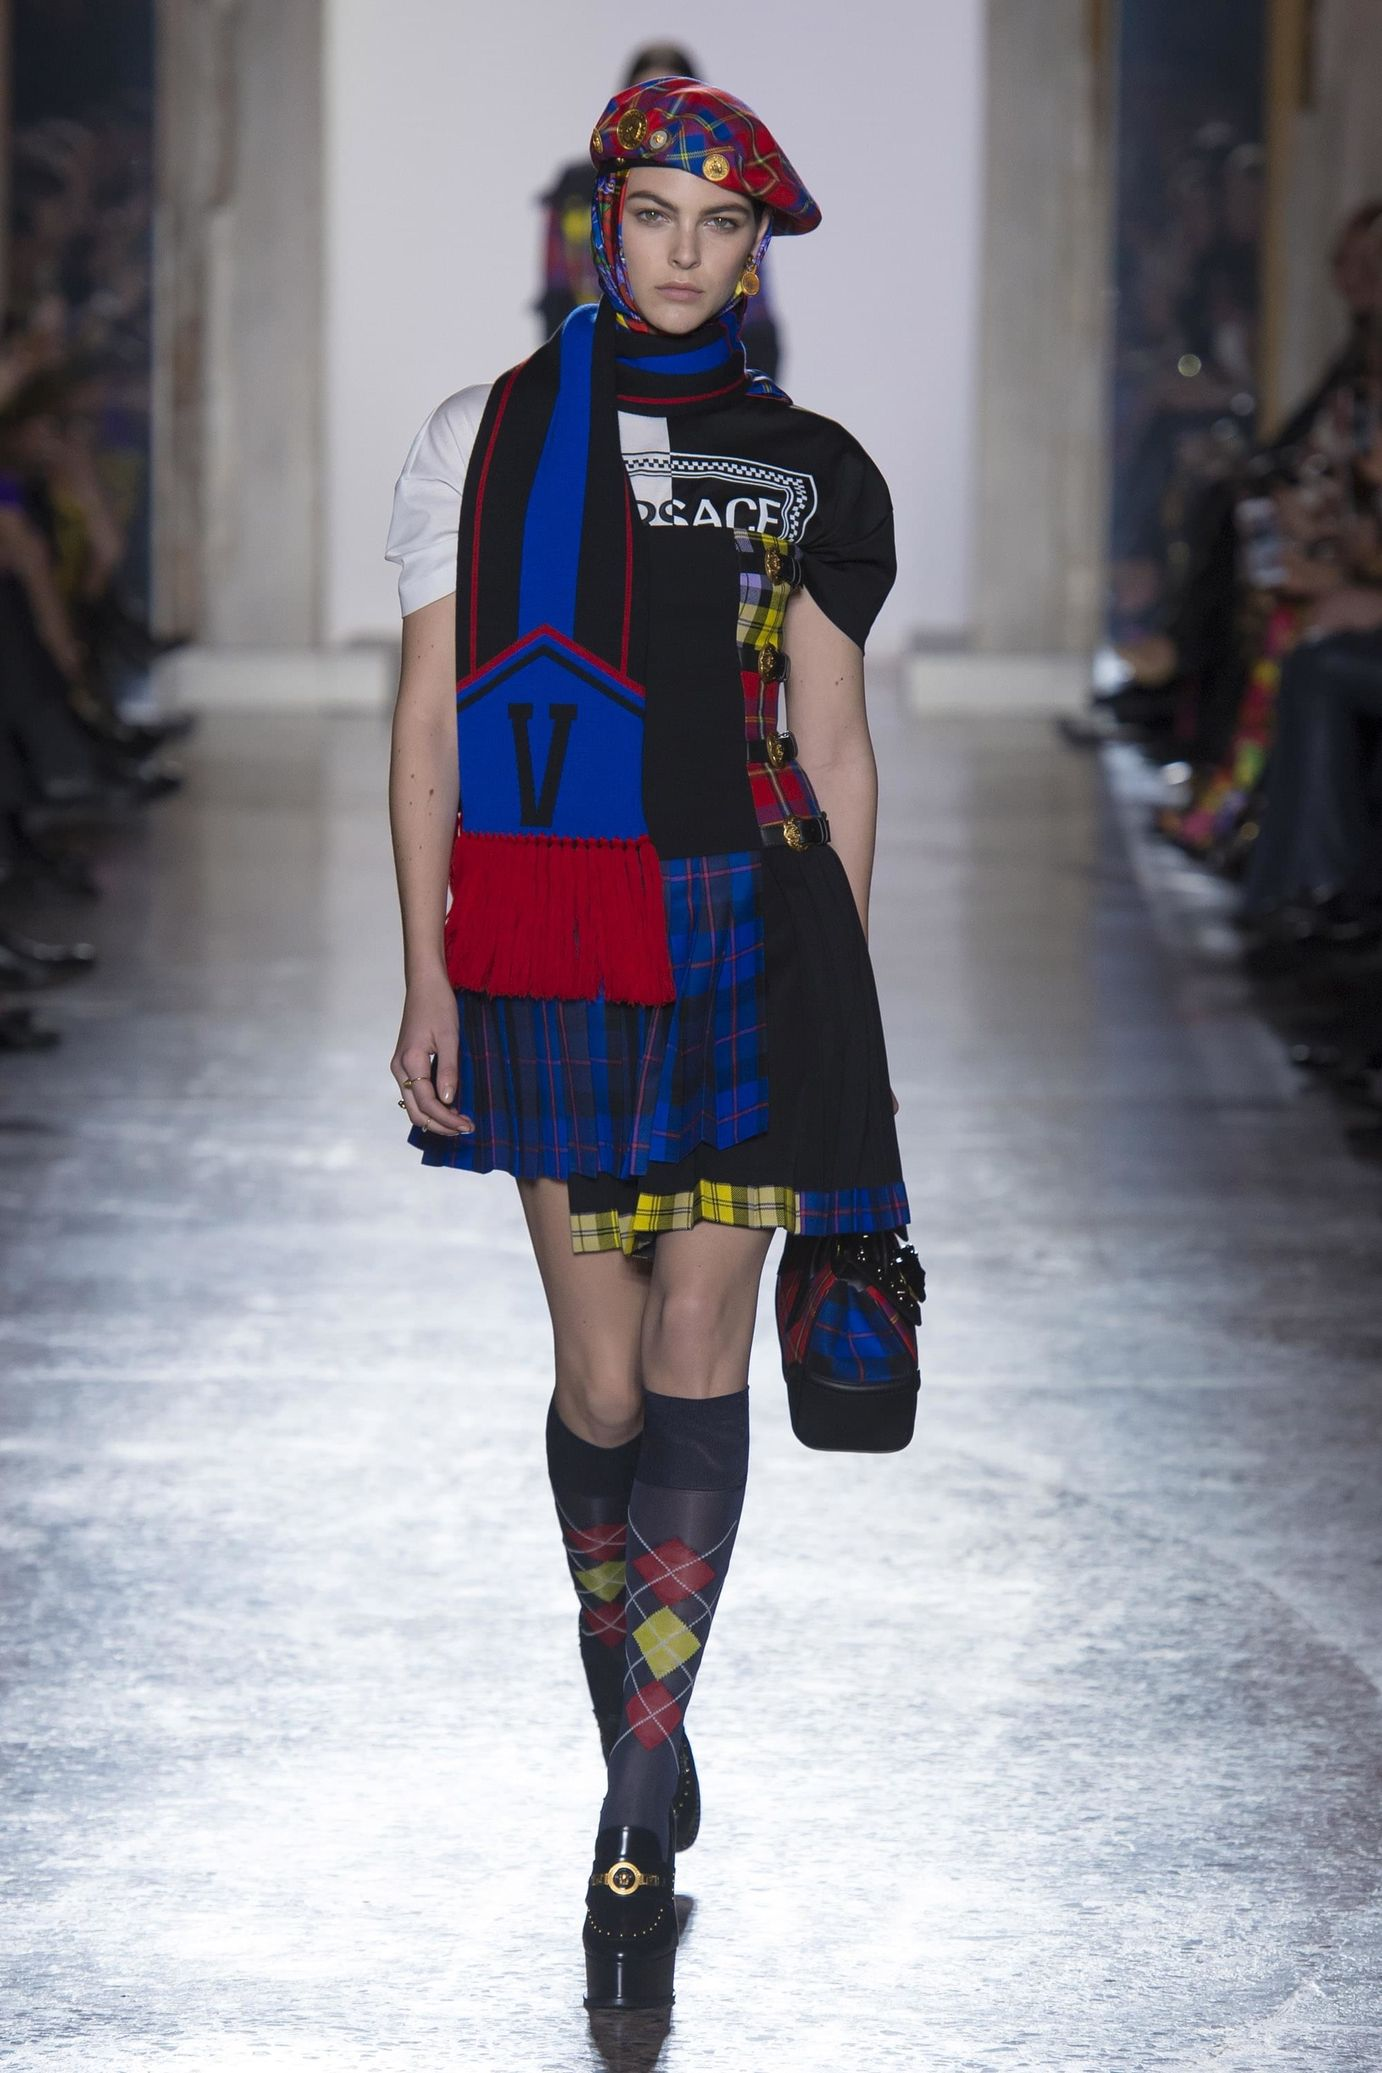 124b0519b26 Versace Ready-to-wear Fall Winter 2018-2019 READY-TO-WEAR Fashion Show